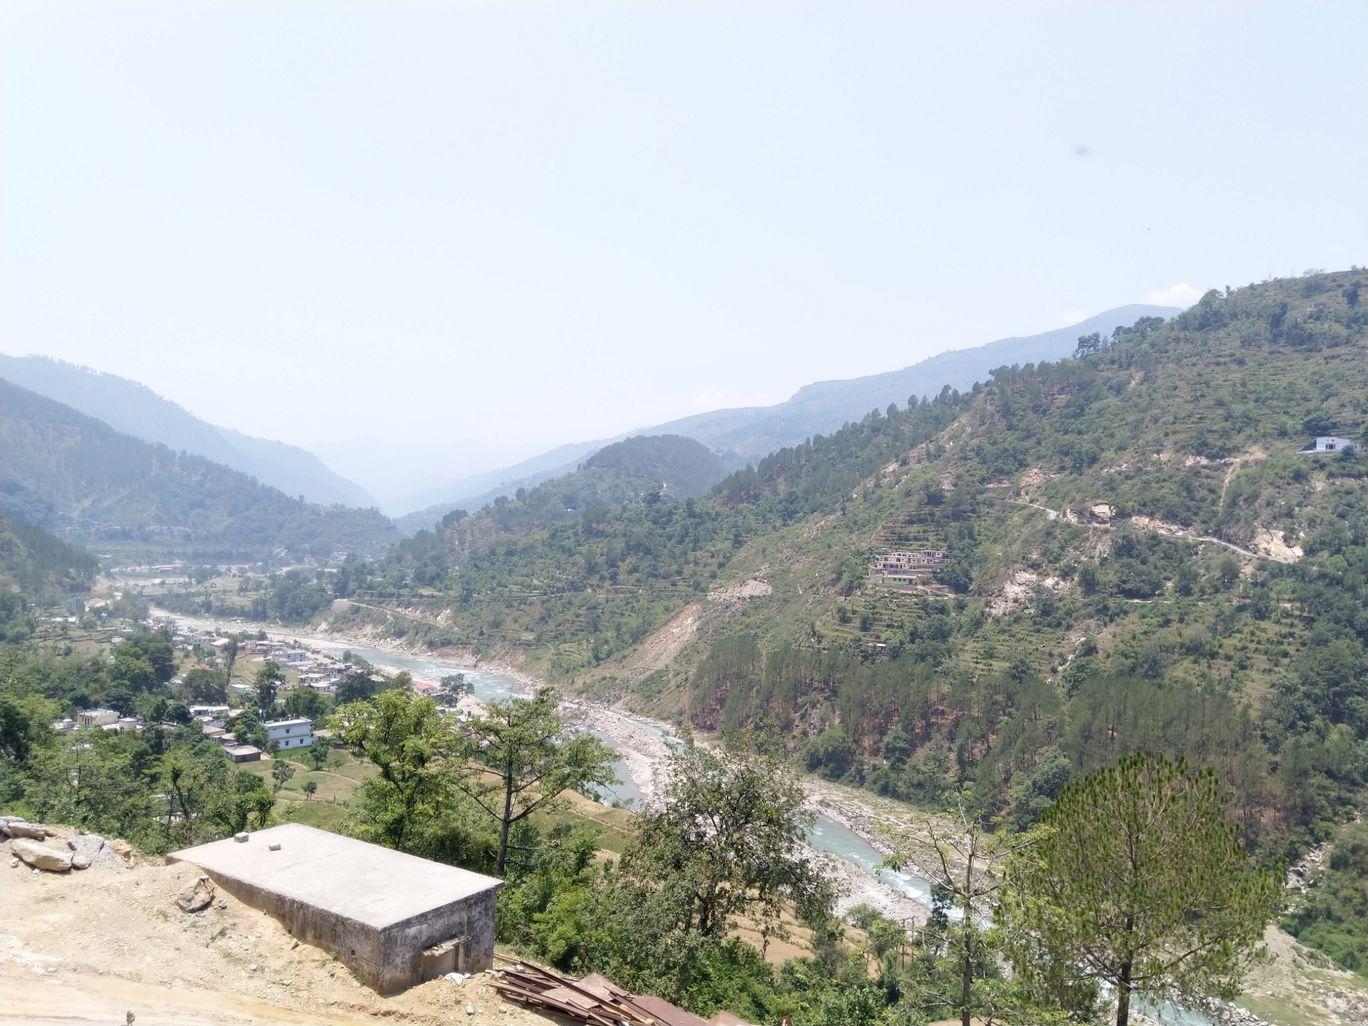 Photo of Singholi Bhatwari Hydro Power-House Road By Manish Verma